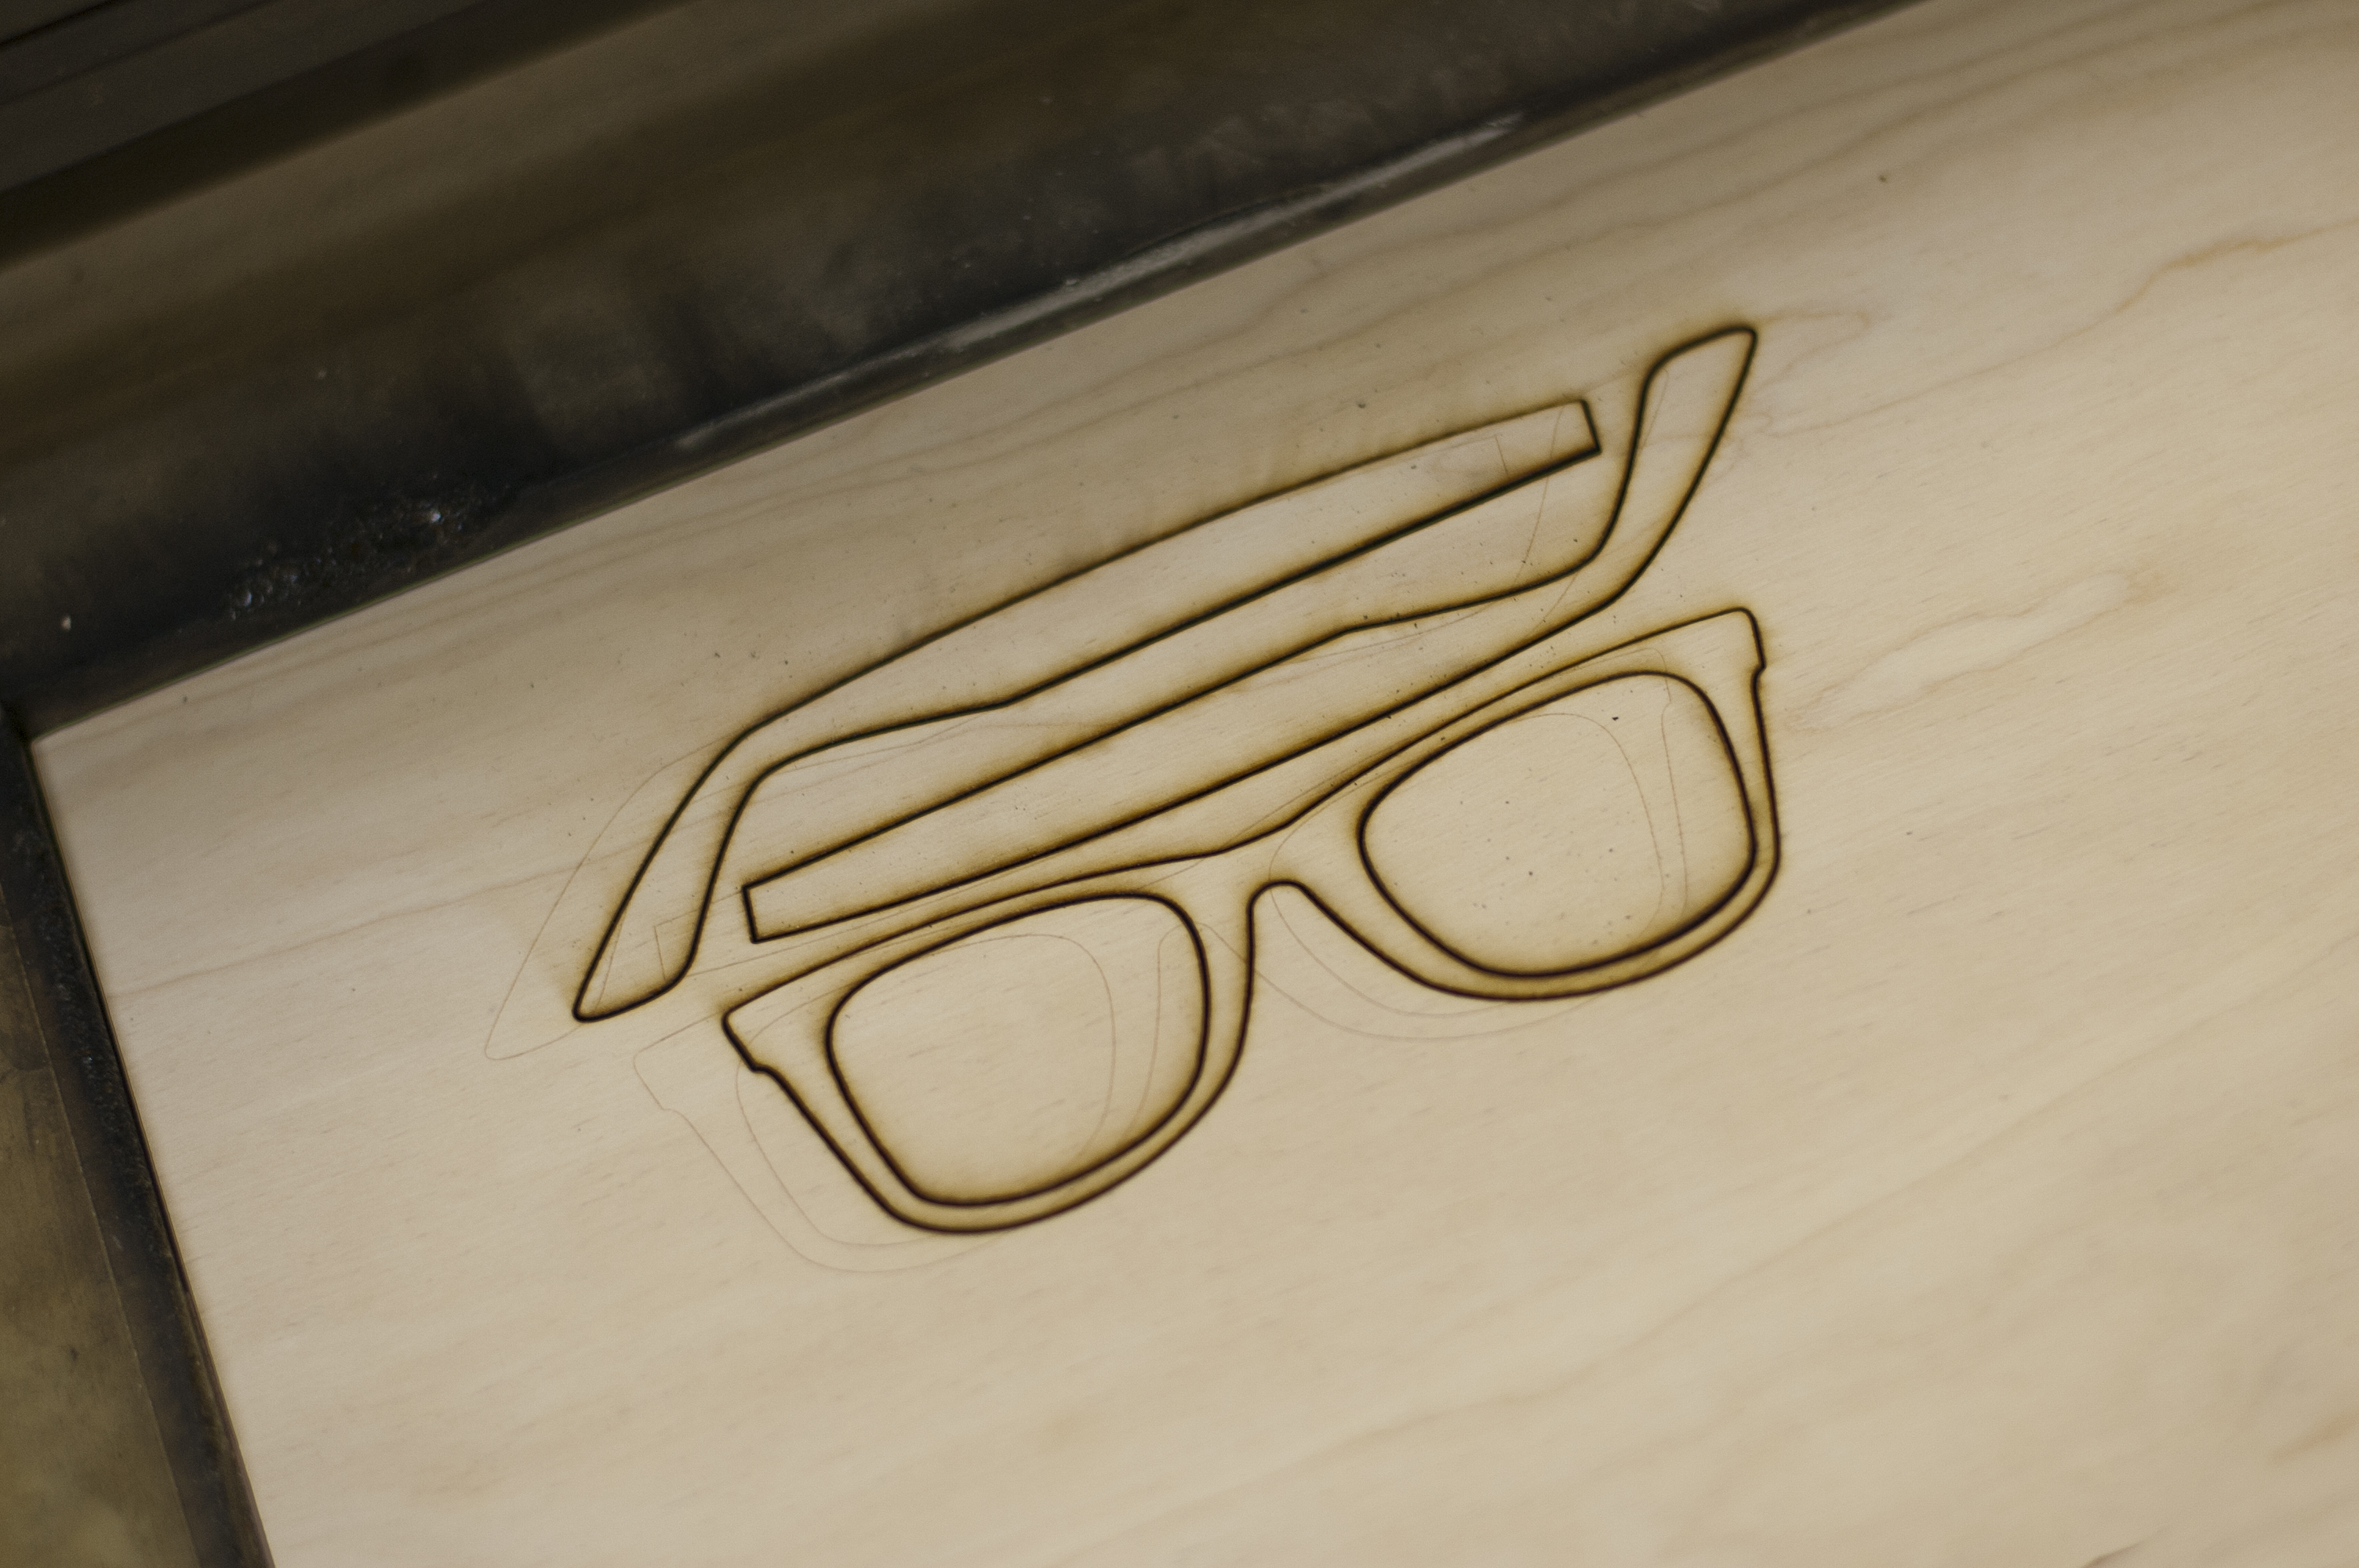 LaserGlasses